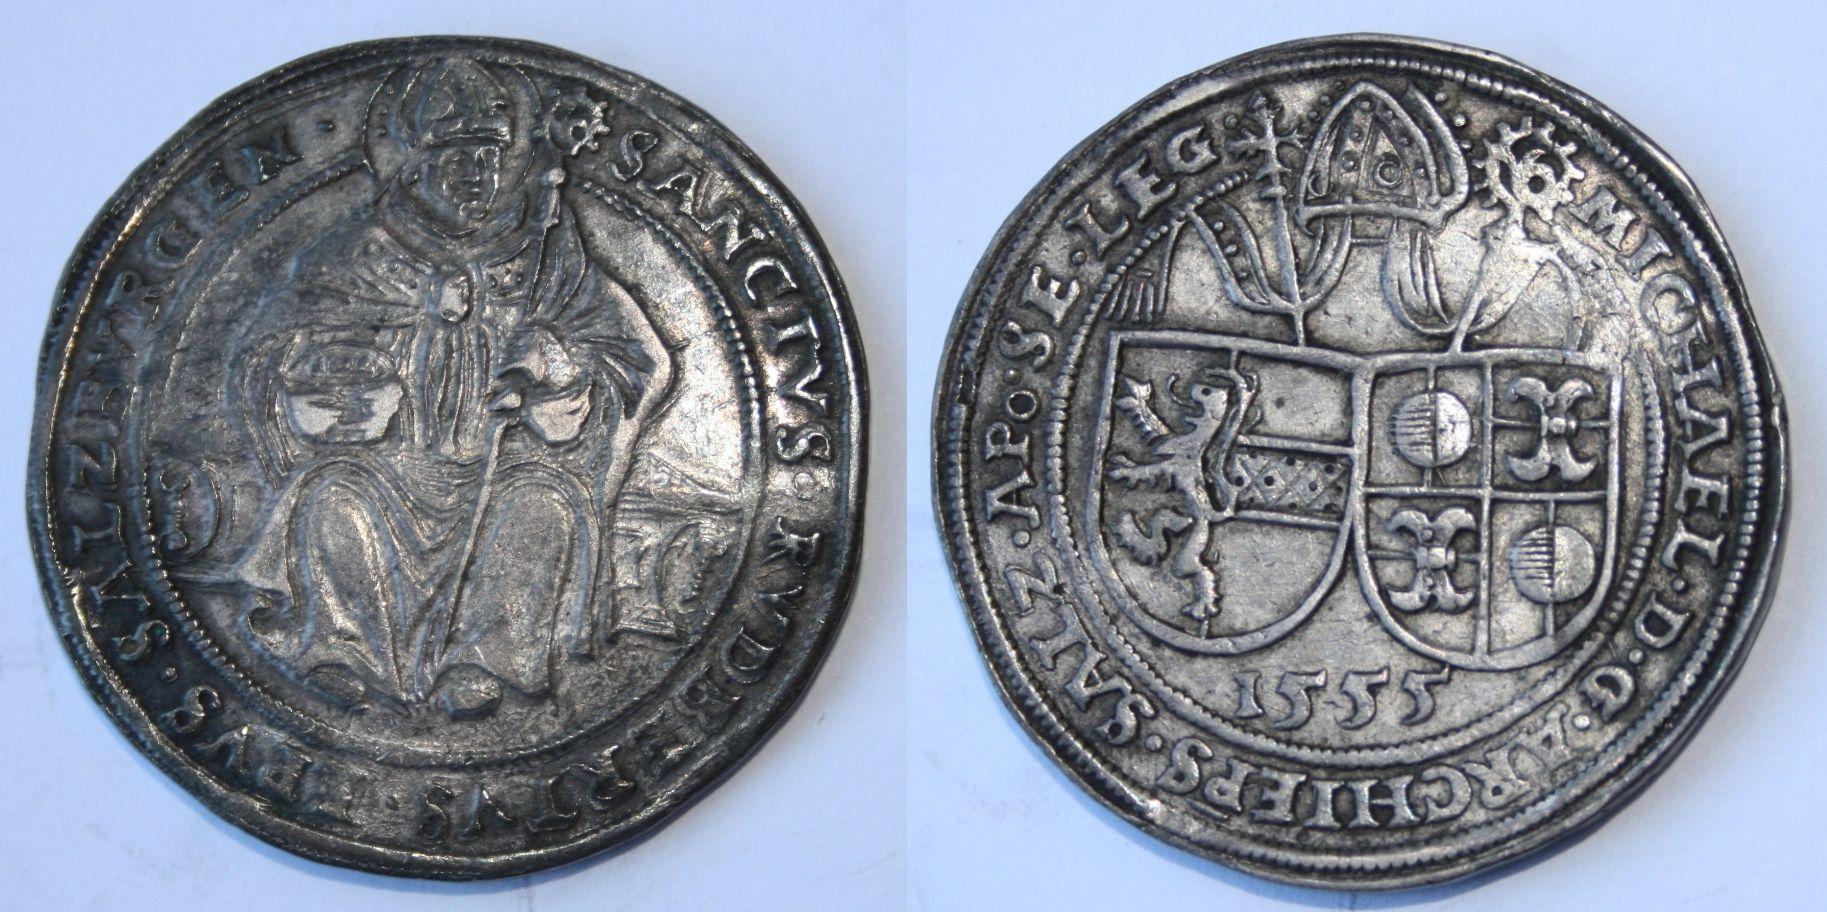 Guldiner 1555, Münzkabinett Gotha 3.2./5537